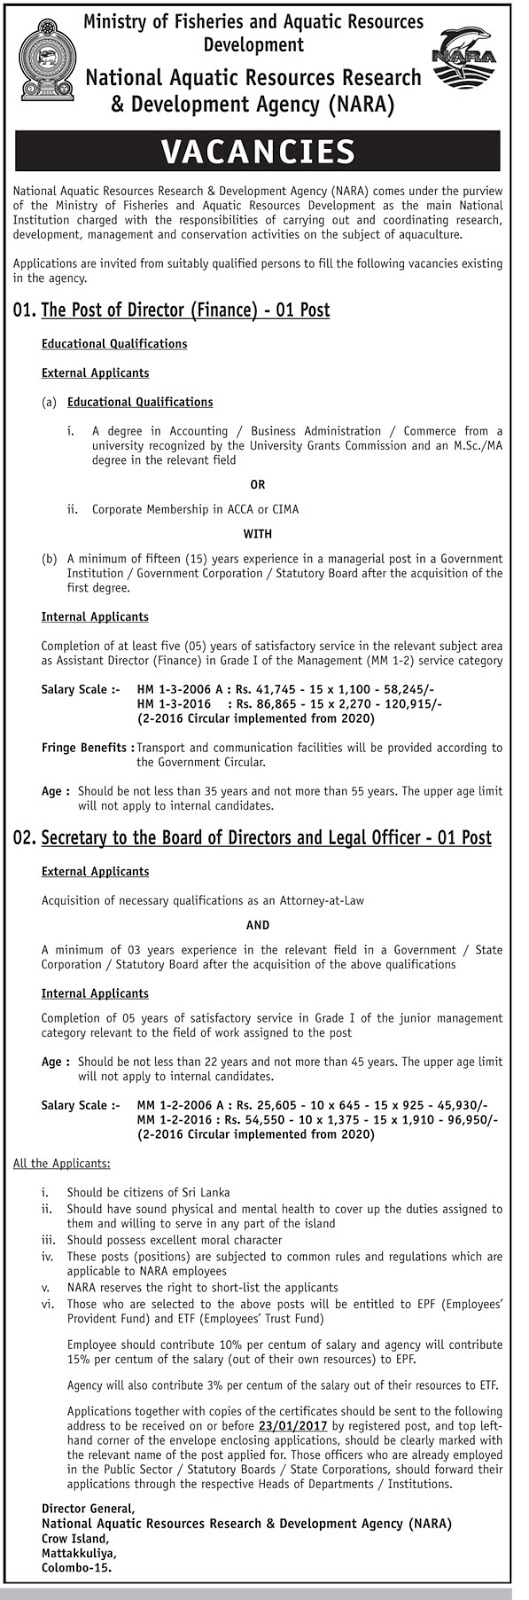 director finance secretary to the board directors legal sri lankan government job vacancies at national aquatic resources research development agency nara